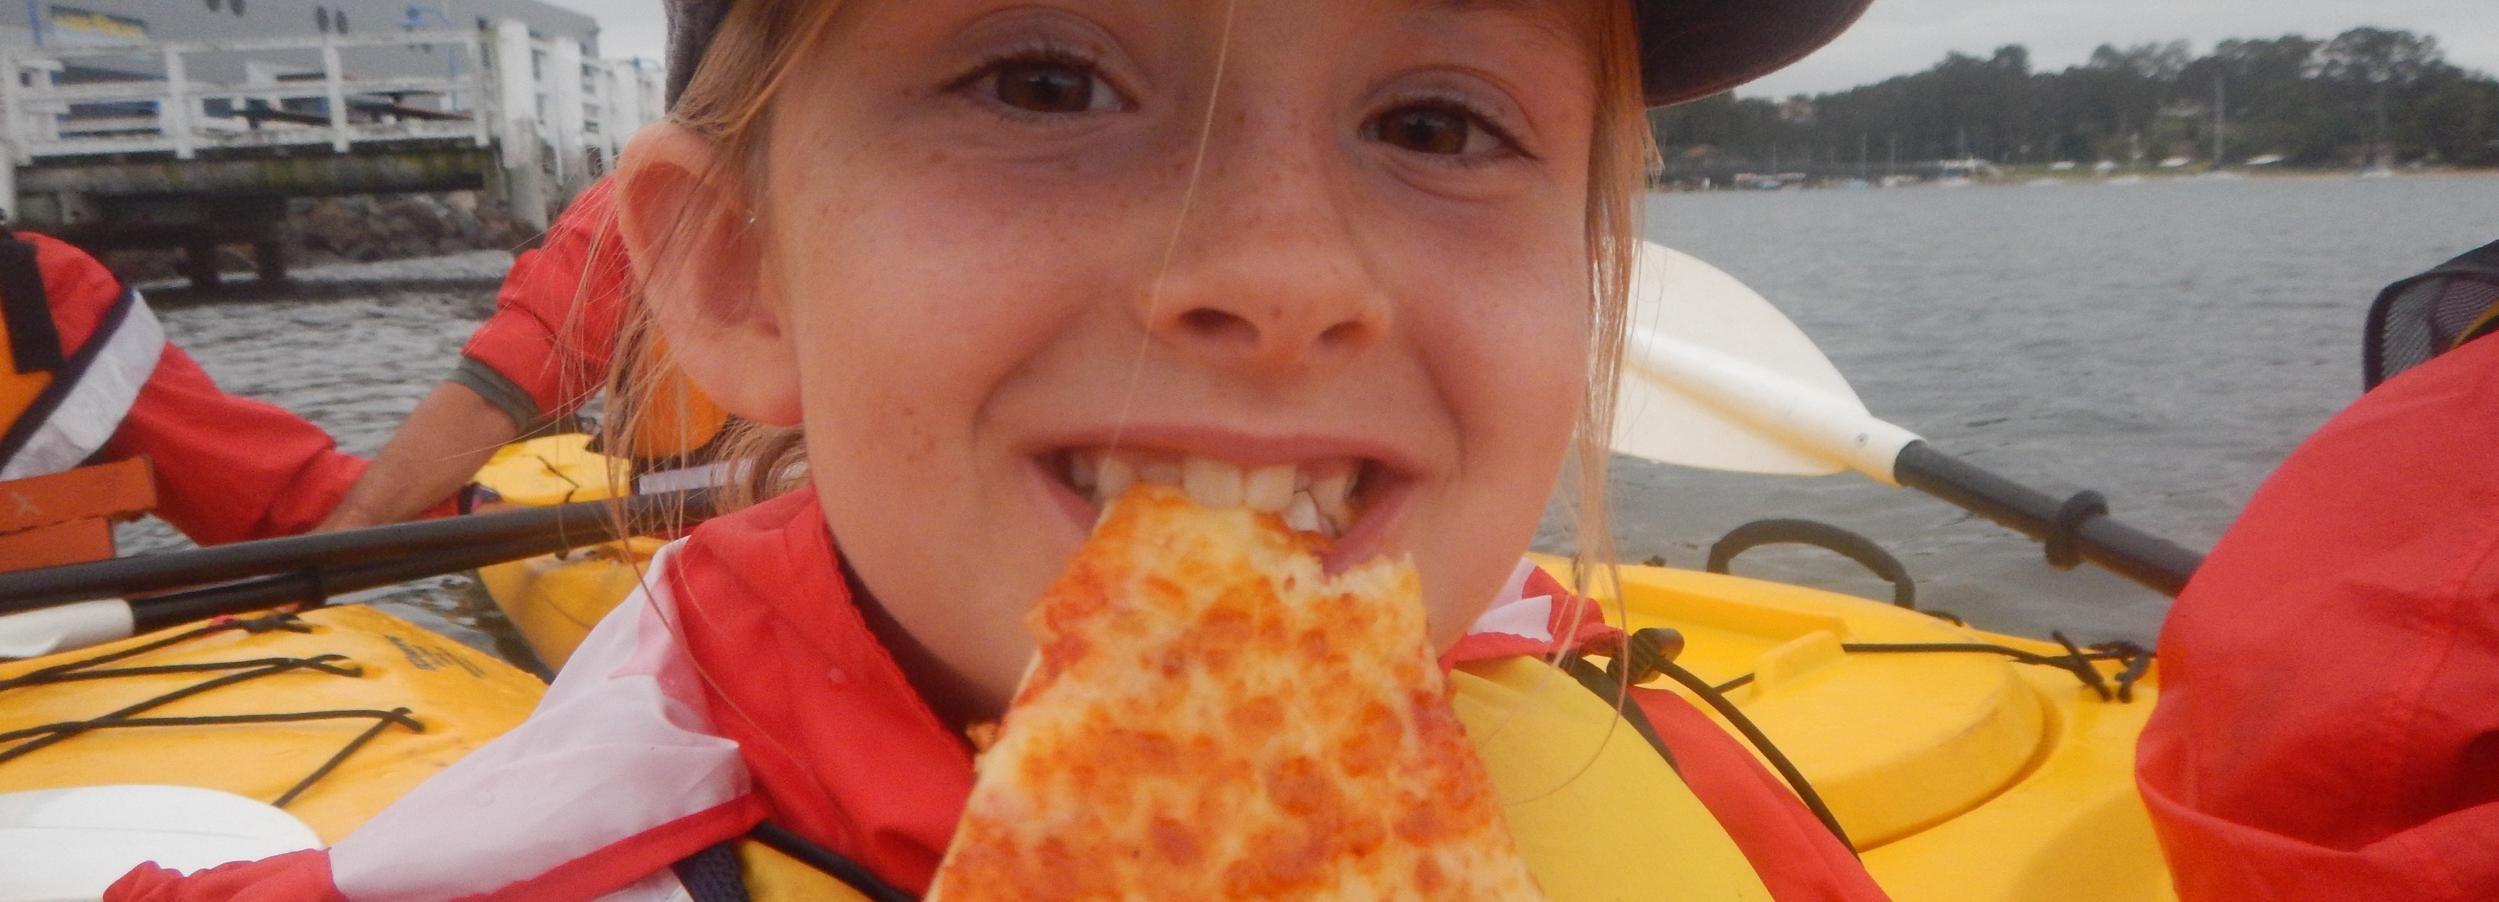 Pizza Paddle - Dinner Kayak Tour in Batemans Bay